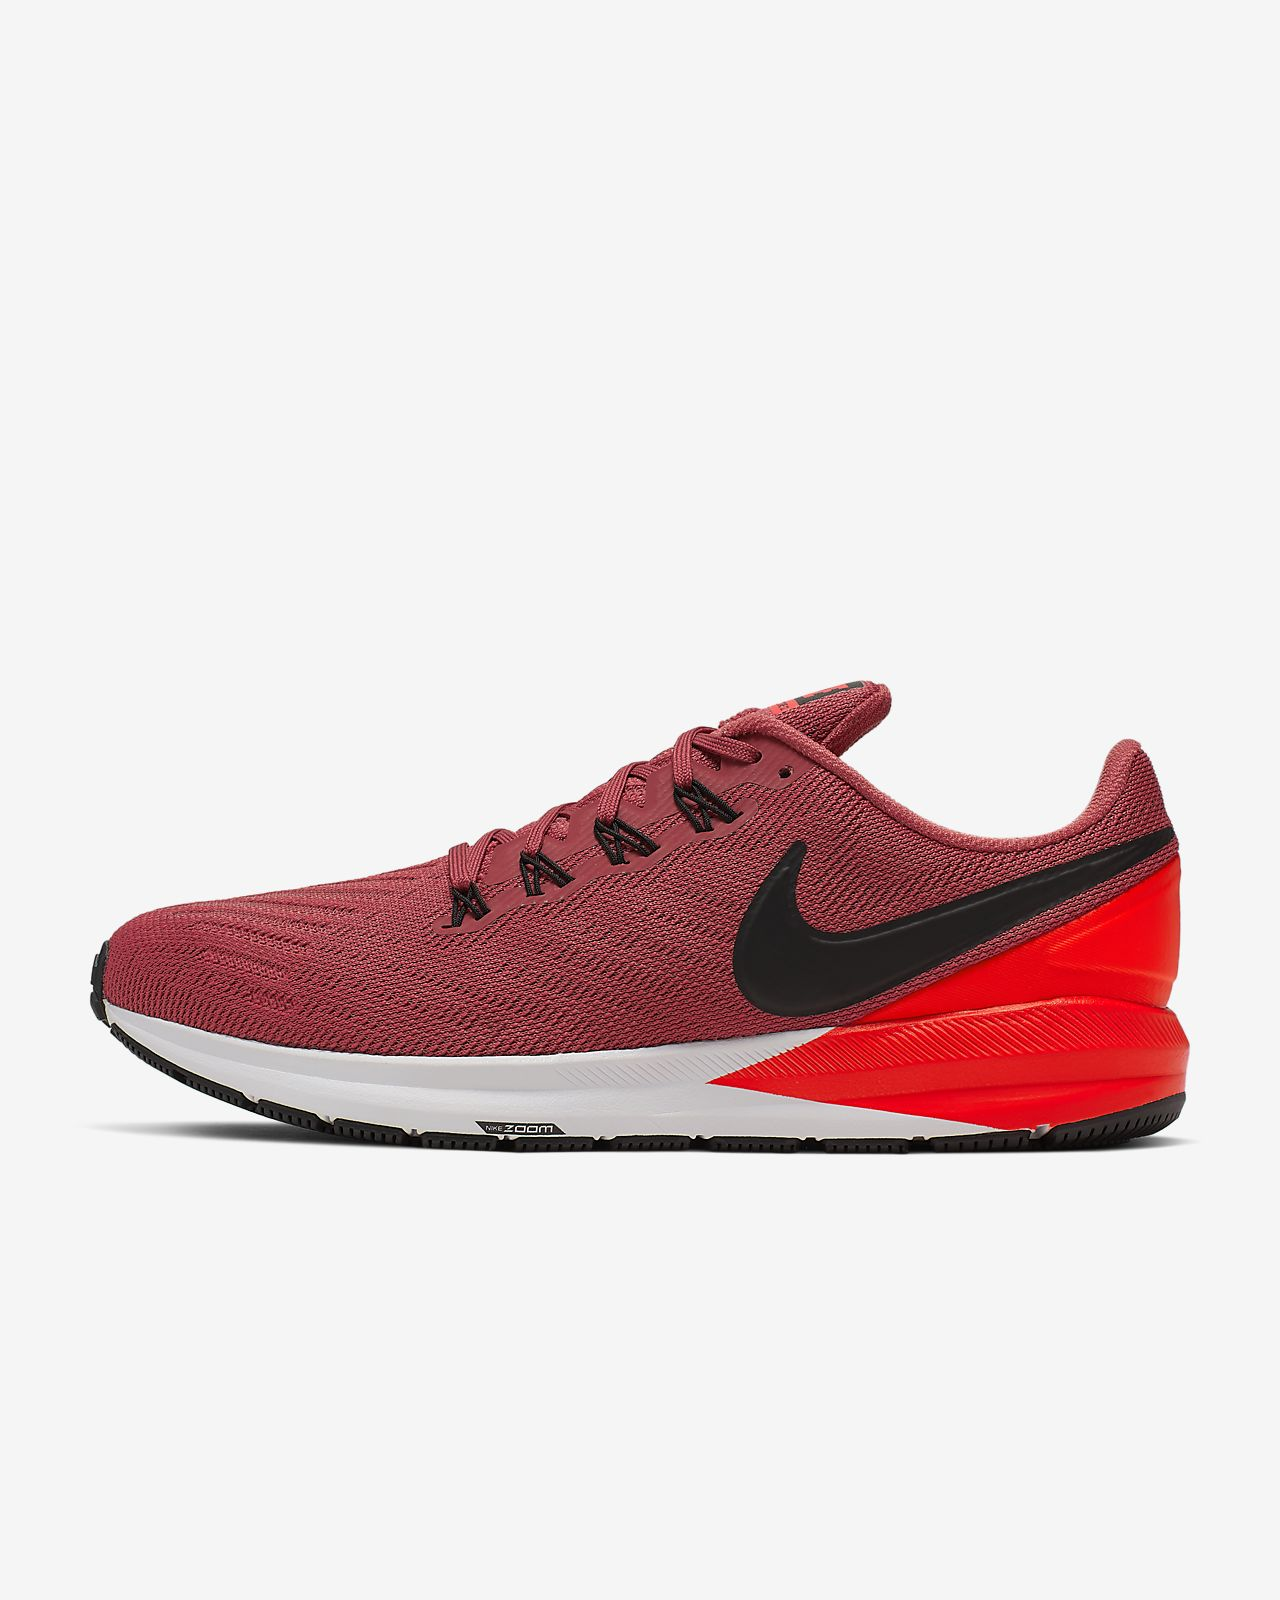 Calzado de running para hombre Nike Air Zoom Structure 22